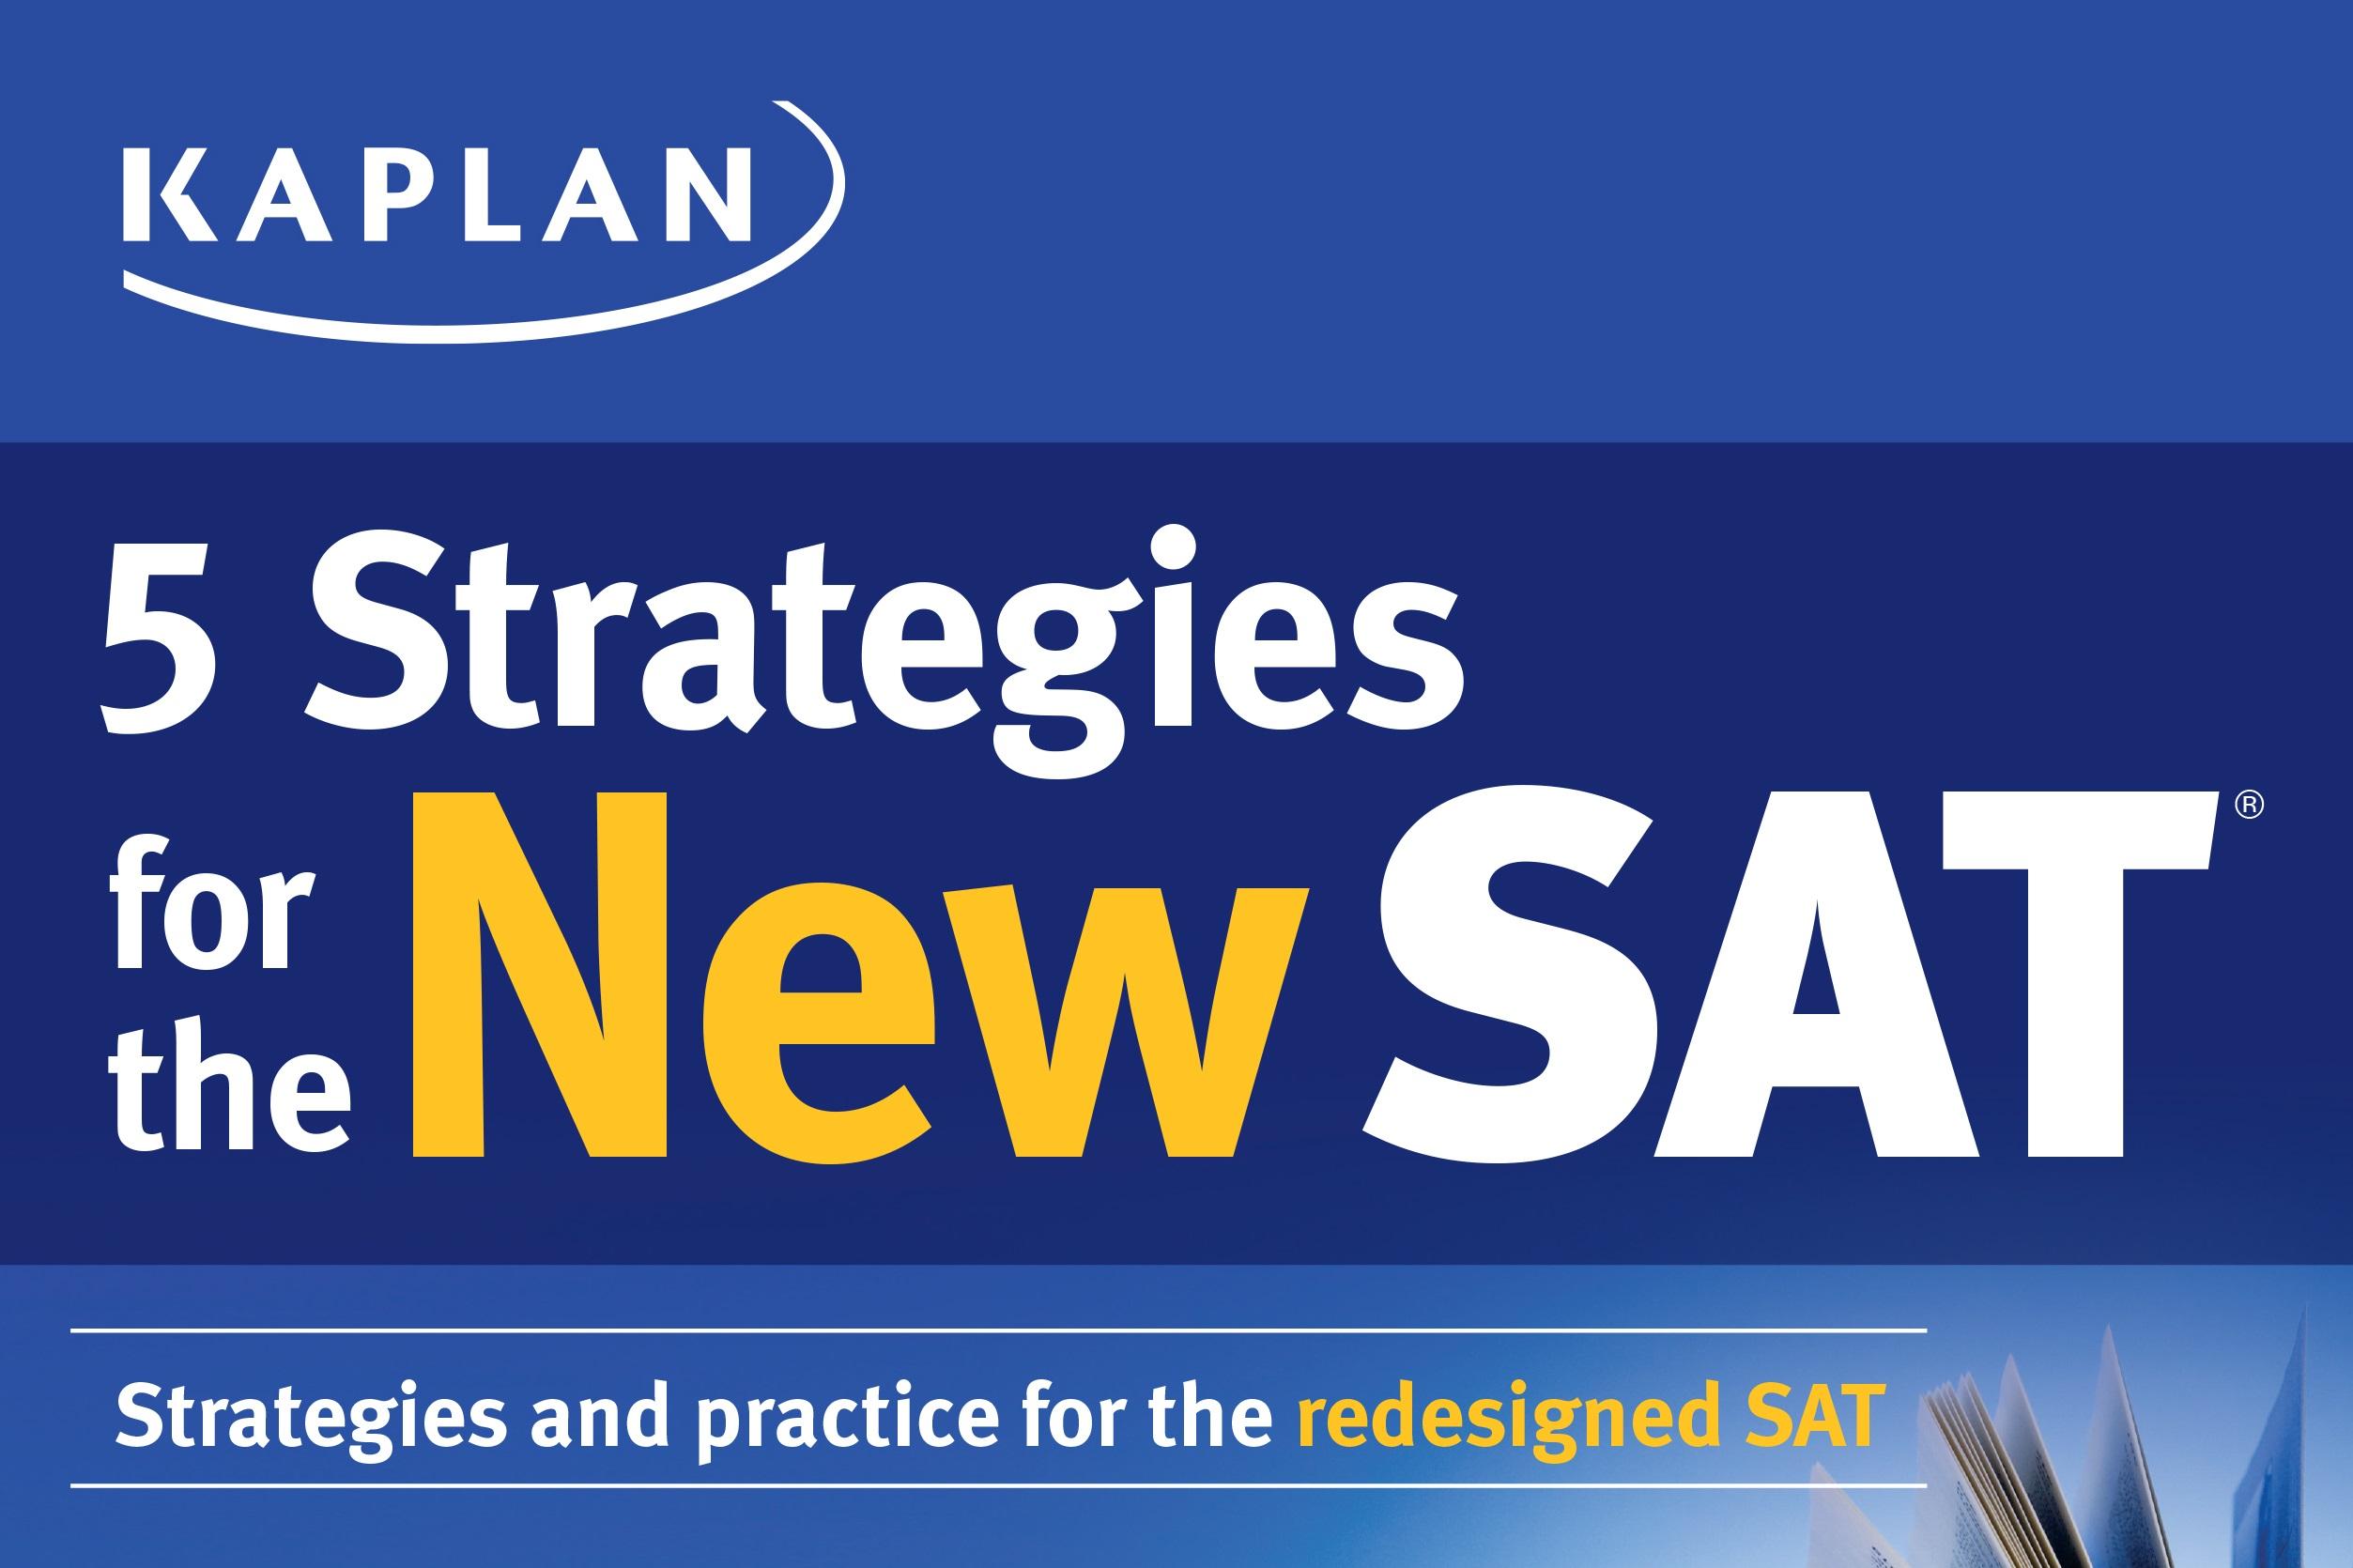 SAT preparation materials marketing pamphlet from Kaplan education business.